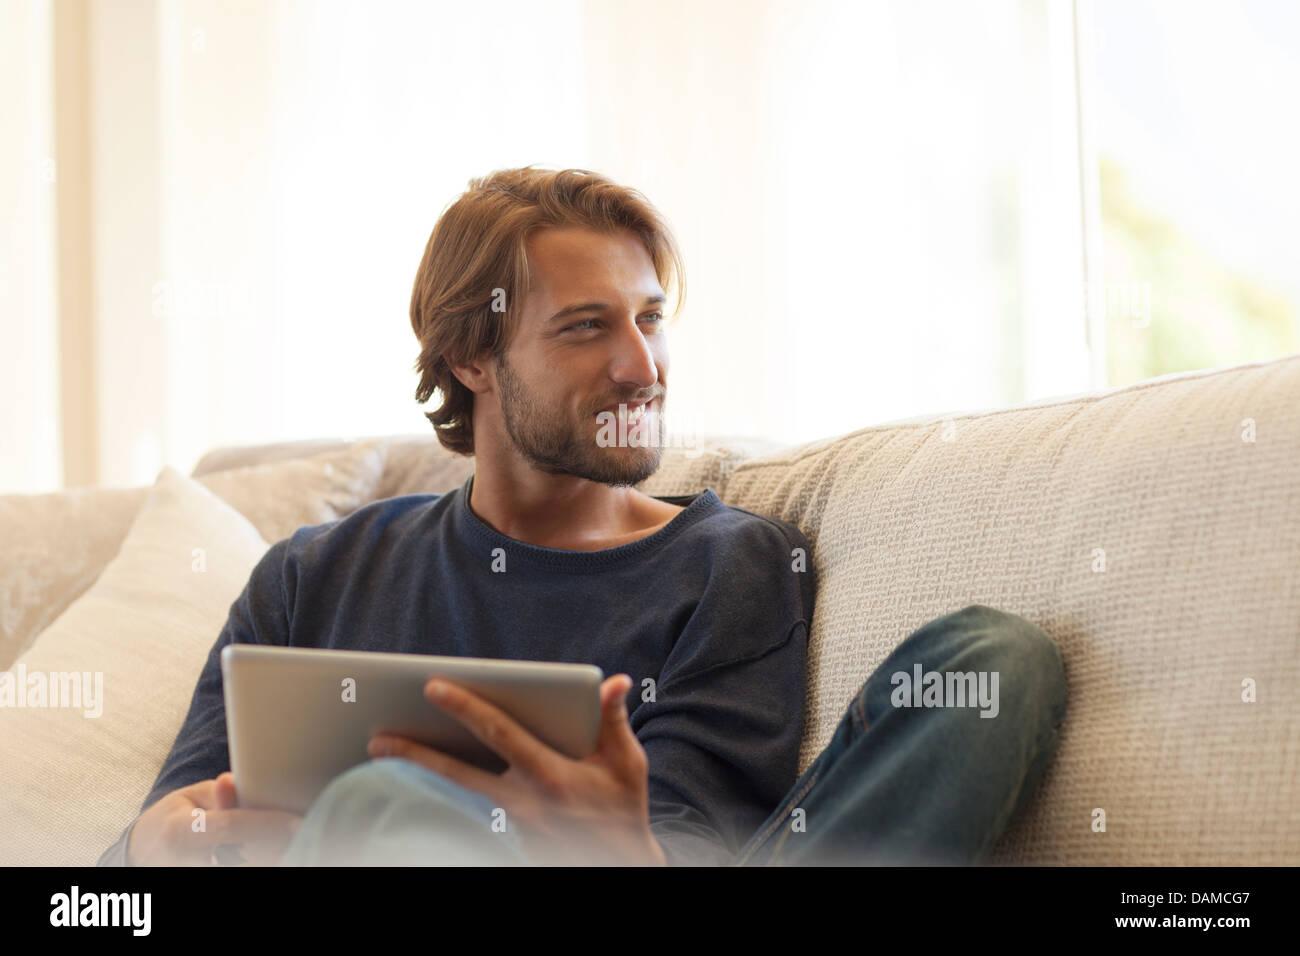 Man using tablet computer on sofa - Stock Image